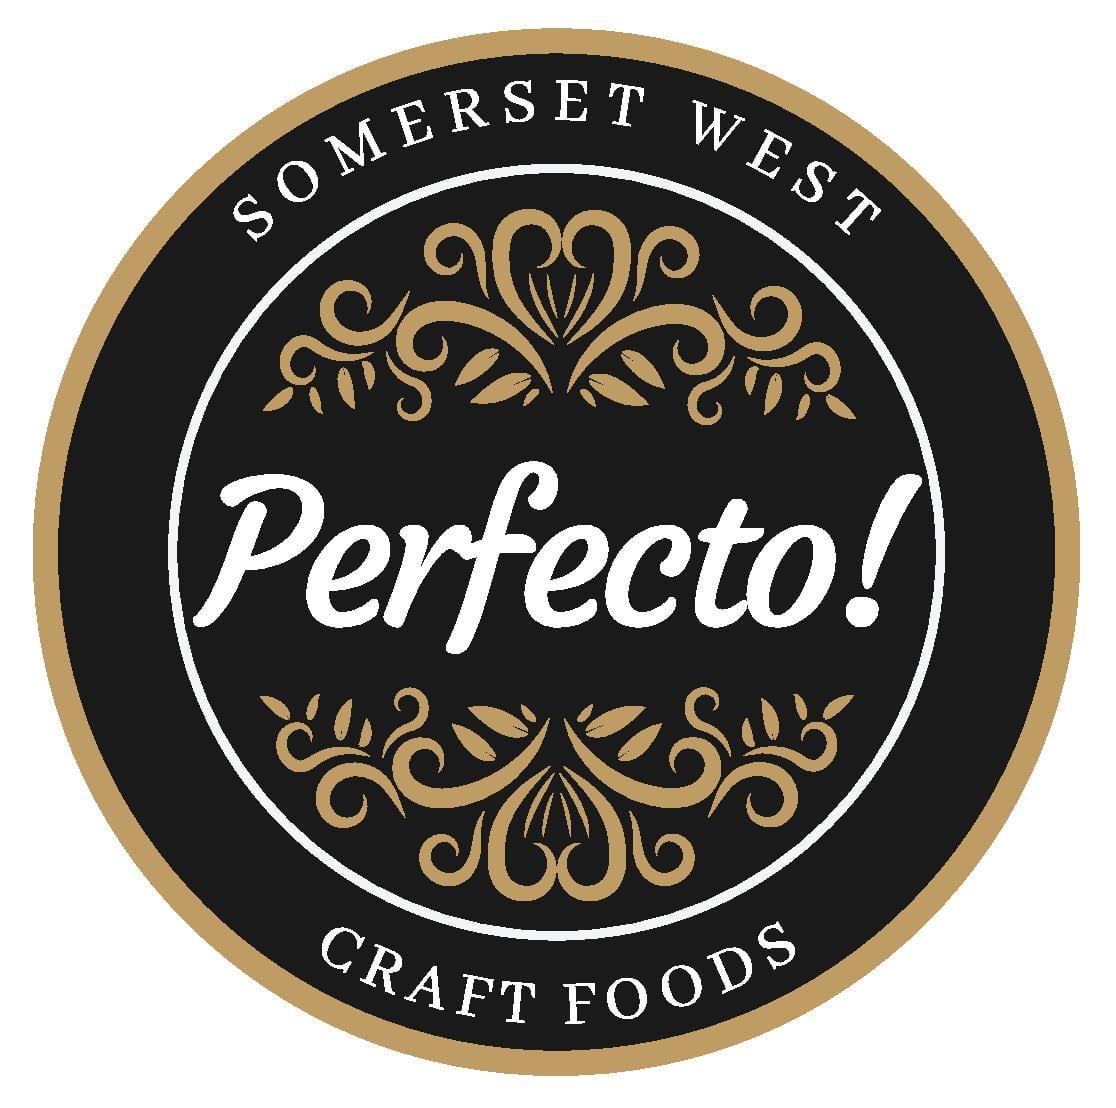 Perfecto Craft Foods logo